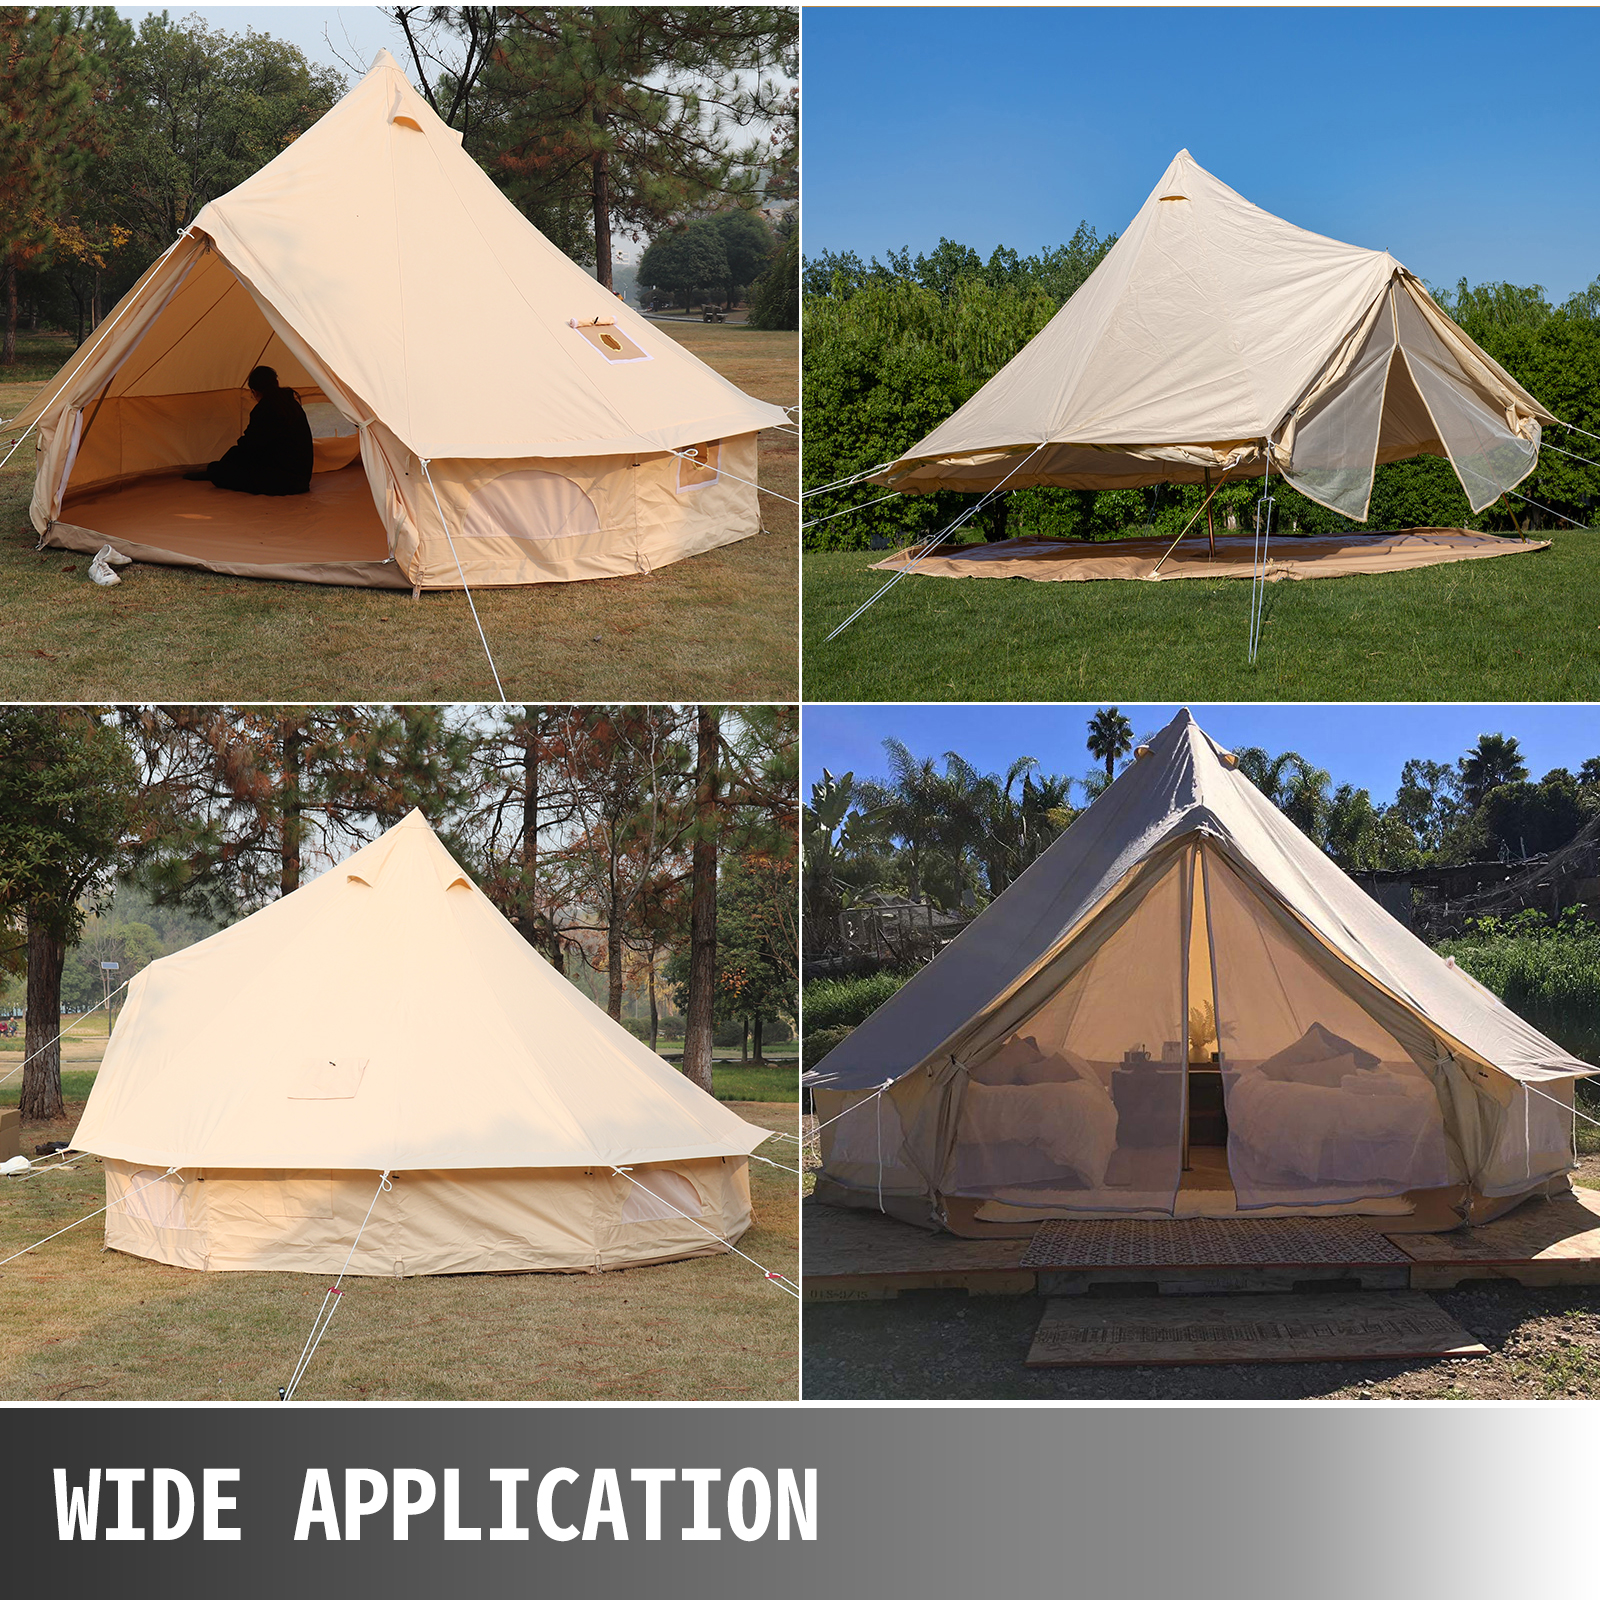 4-Season-Bell-Tent-3-4-5-6M-Waterproof-Cotton-Canvas-Glamping-Camping-Beach-US thumbnail 55